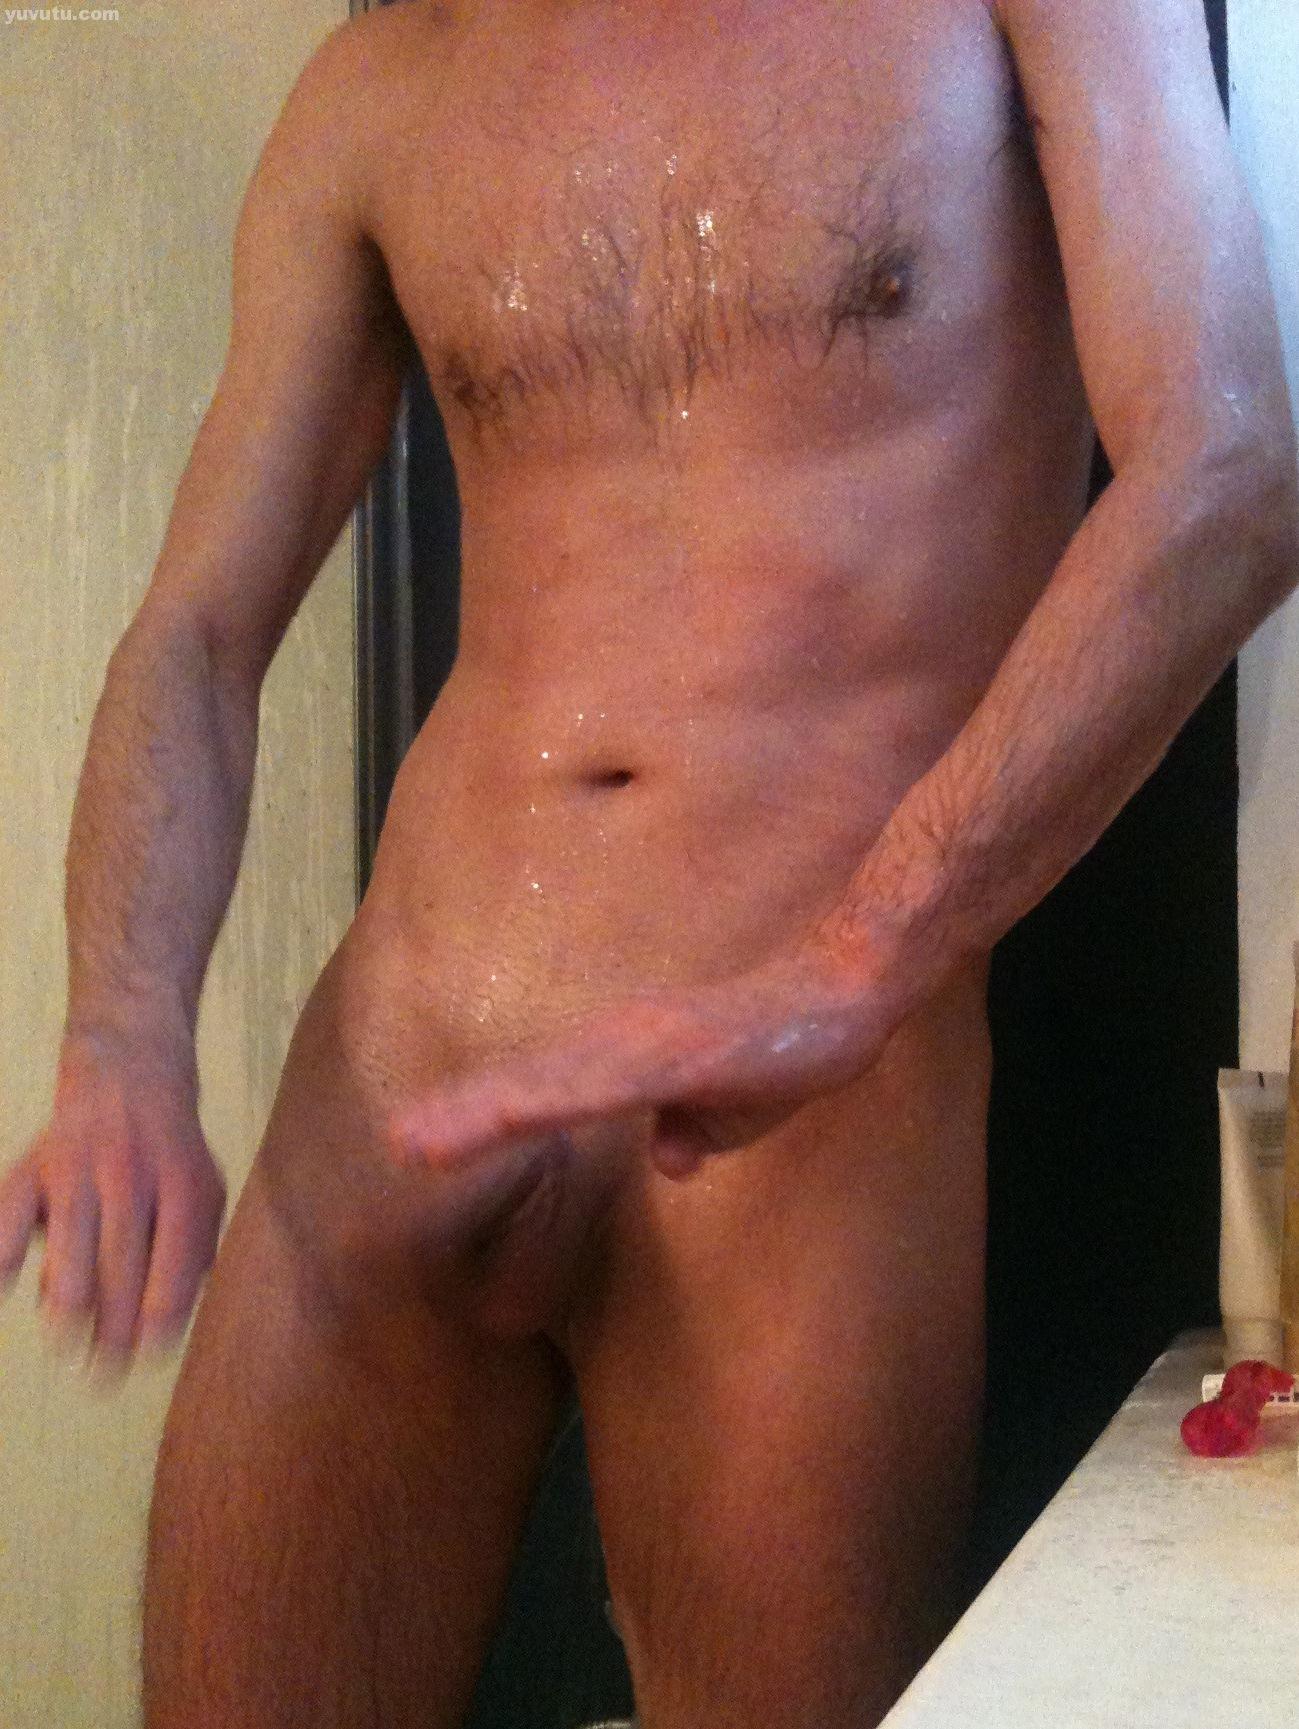 Shower slideshow on yuvutu homemade amateur porn movies and sex videos